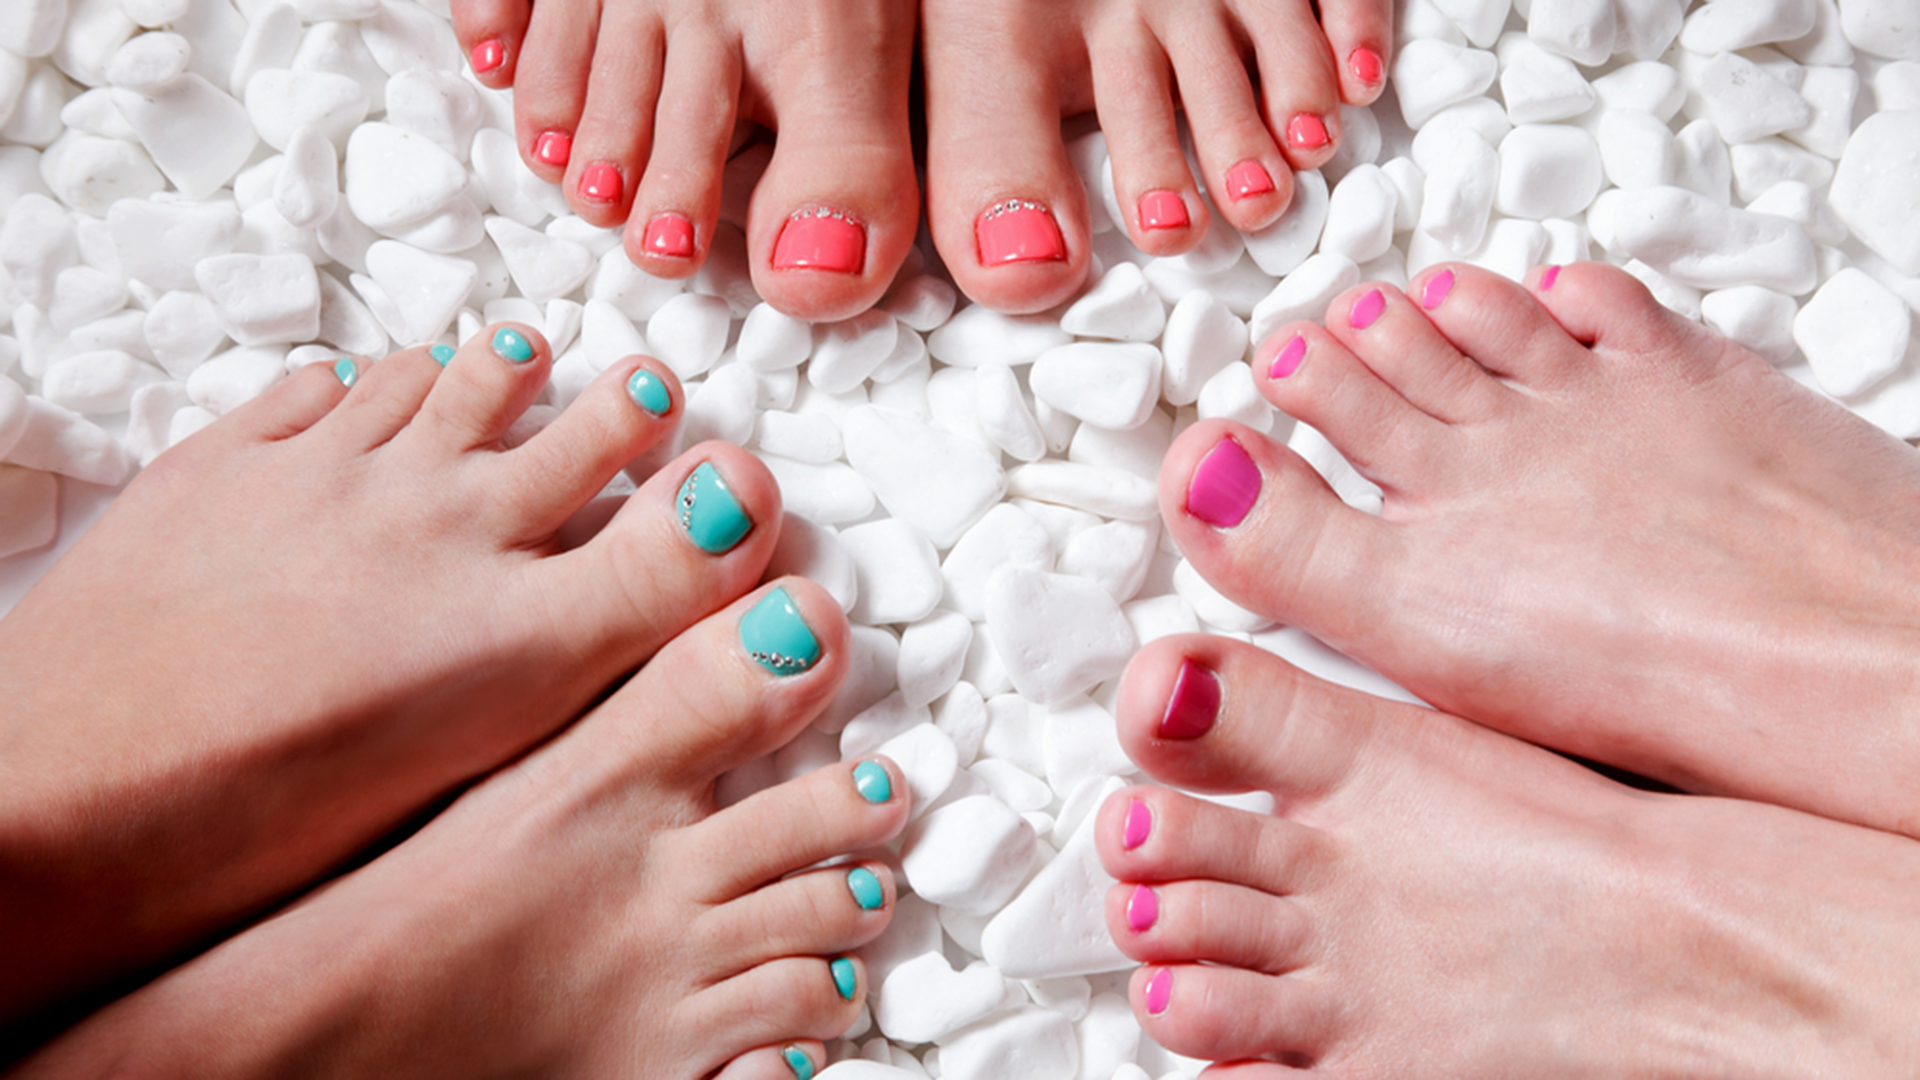 painted-toenails-today-150707-stock-tease_675ae4c5f10b7eee77e1a6d59099862b.jpg